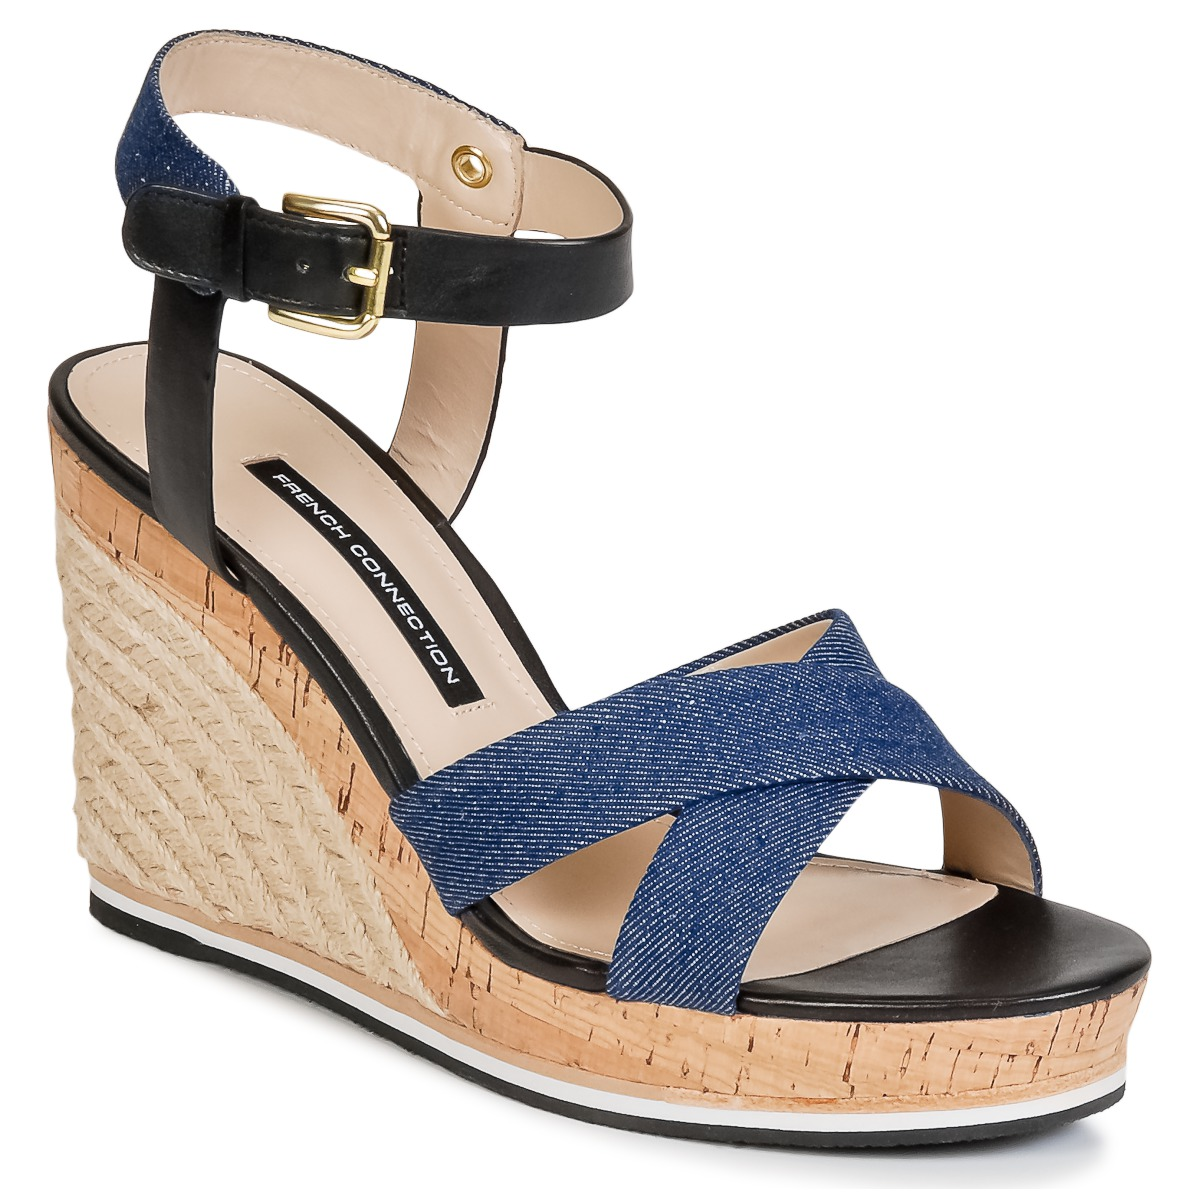 Sandale French Connection LATA Bleu denim